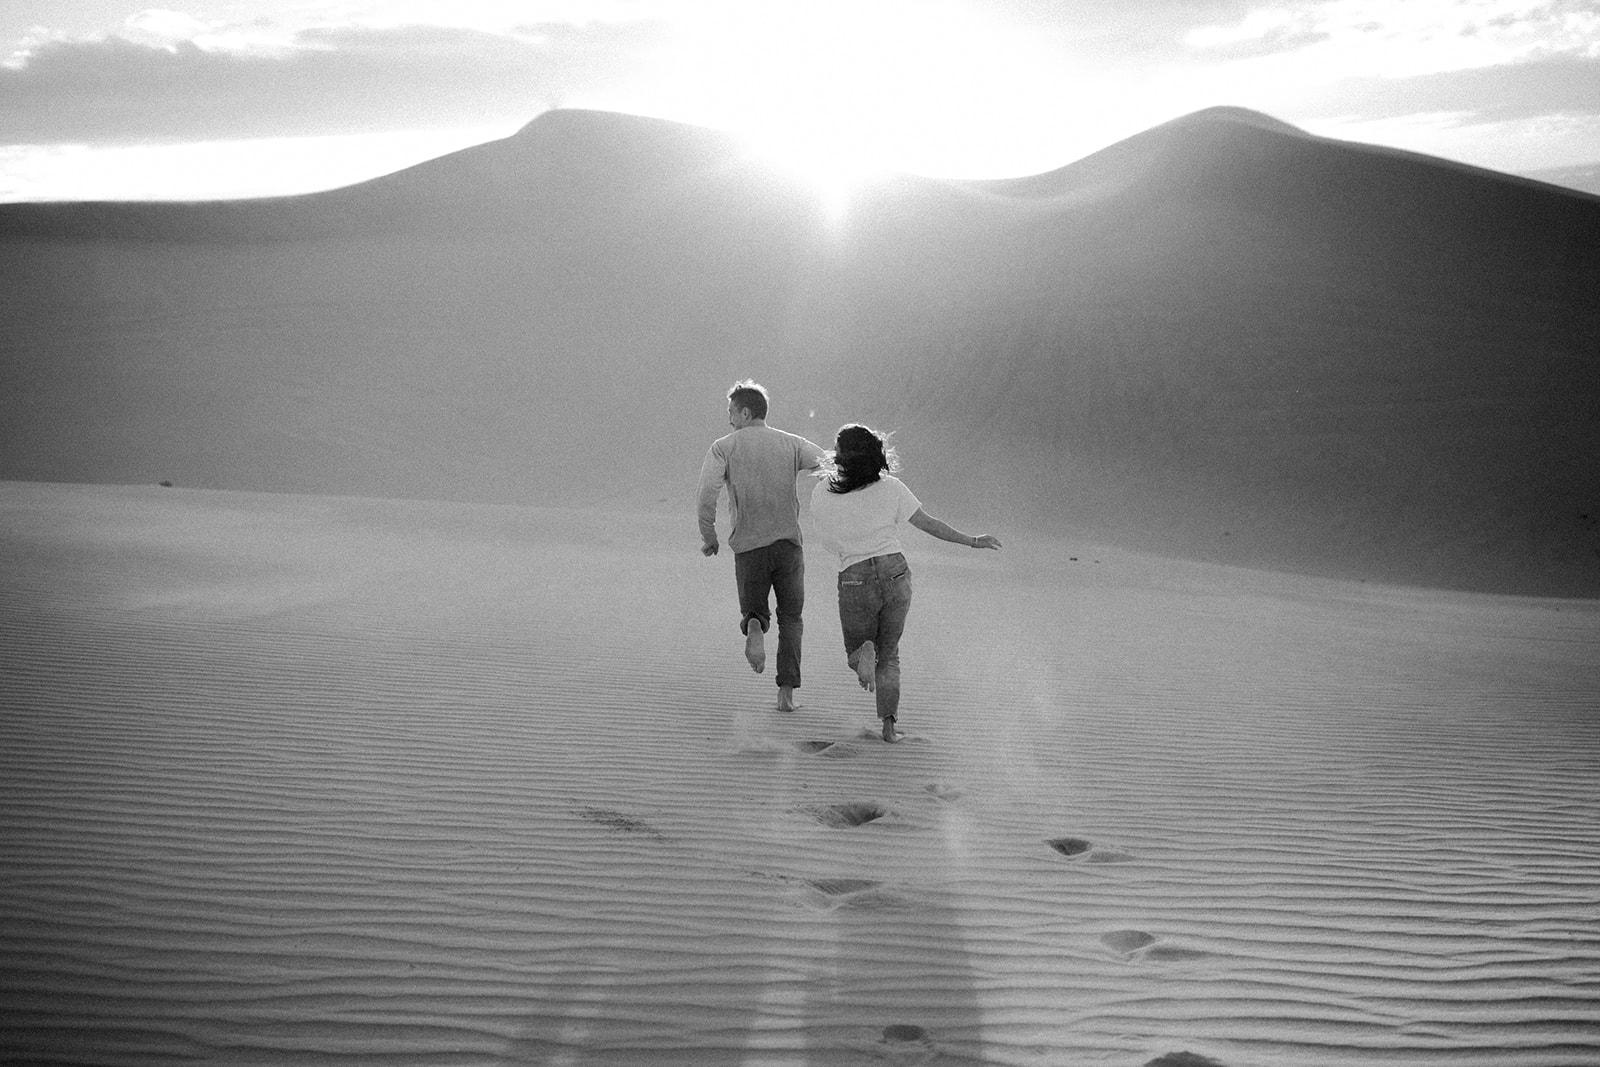 Imperial_Sand_Dunes_Linda_and_Sam_Dawn_Charles_Photographer-78.jpg